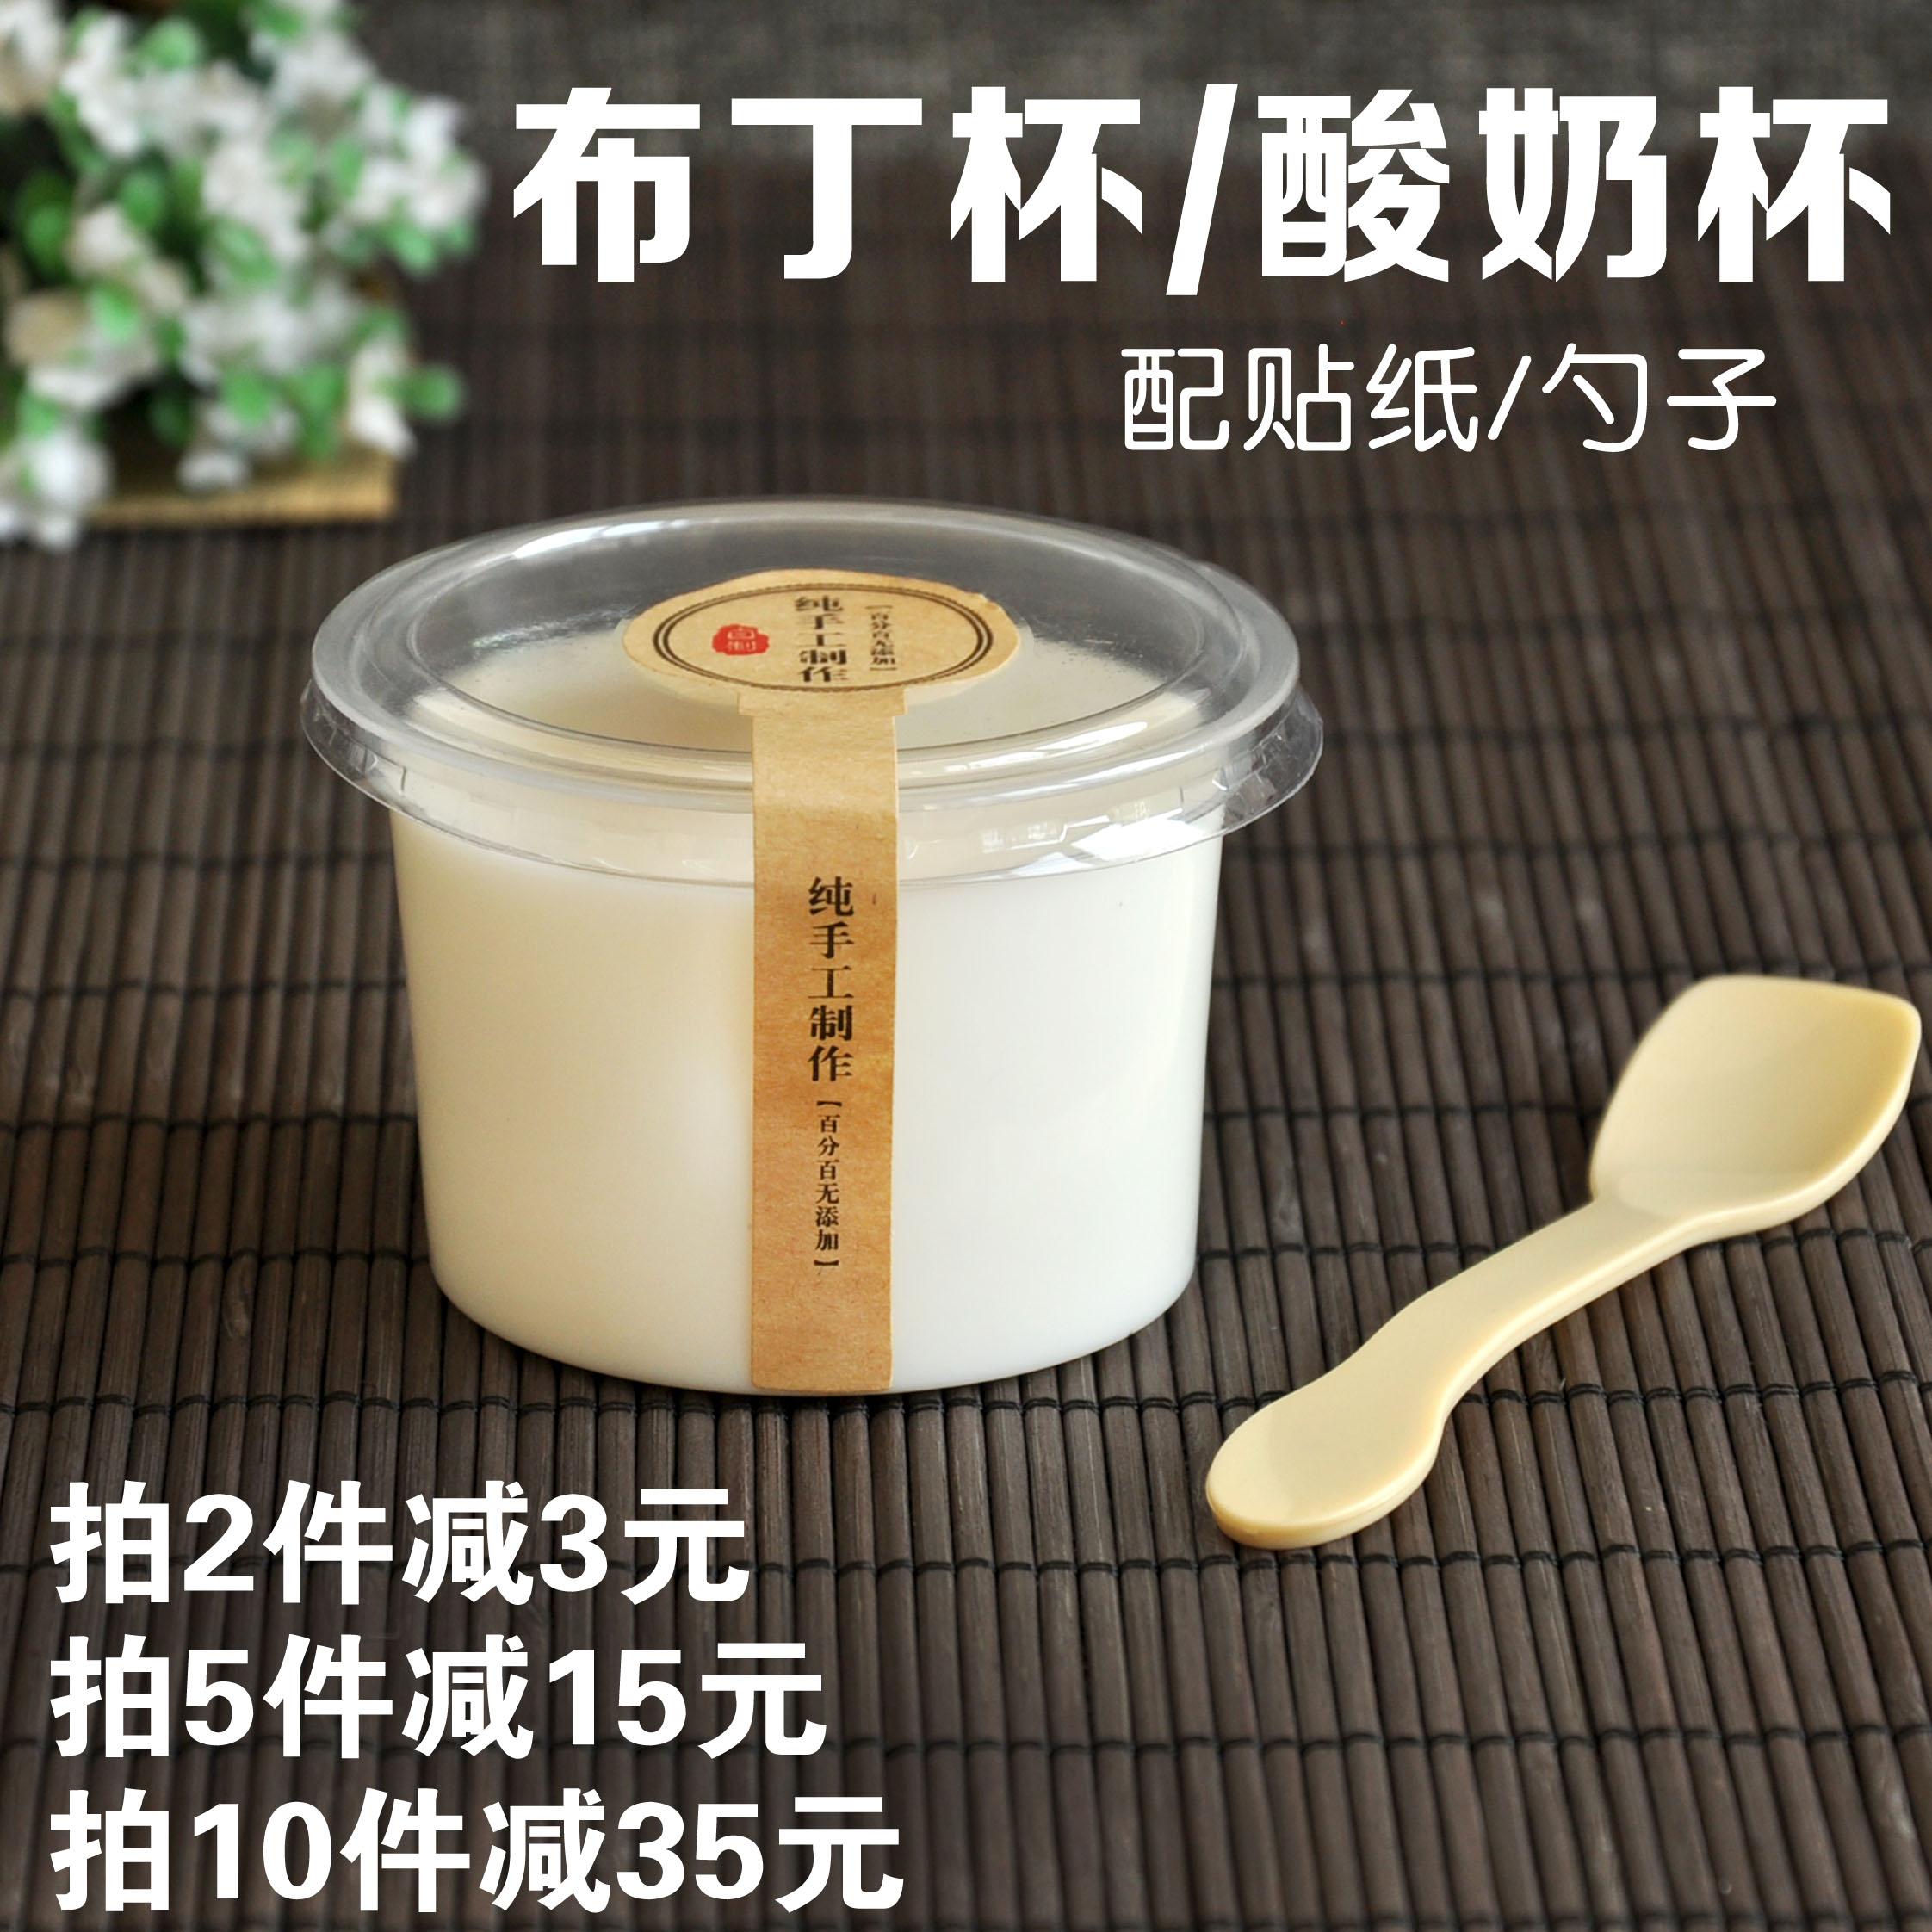 100ml克 带盖酸奶杯一次性布丁杯塑料双皮奶杯冰淇淋慕斯杯果冻杯